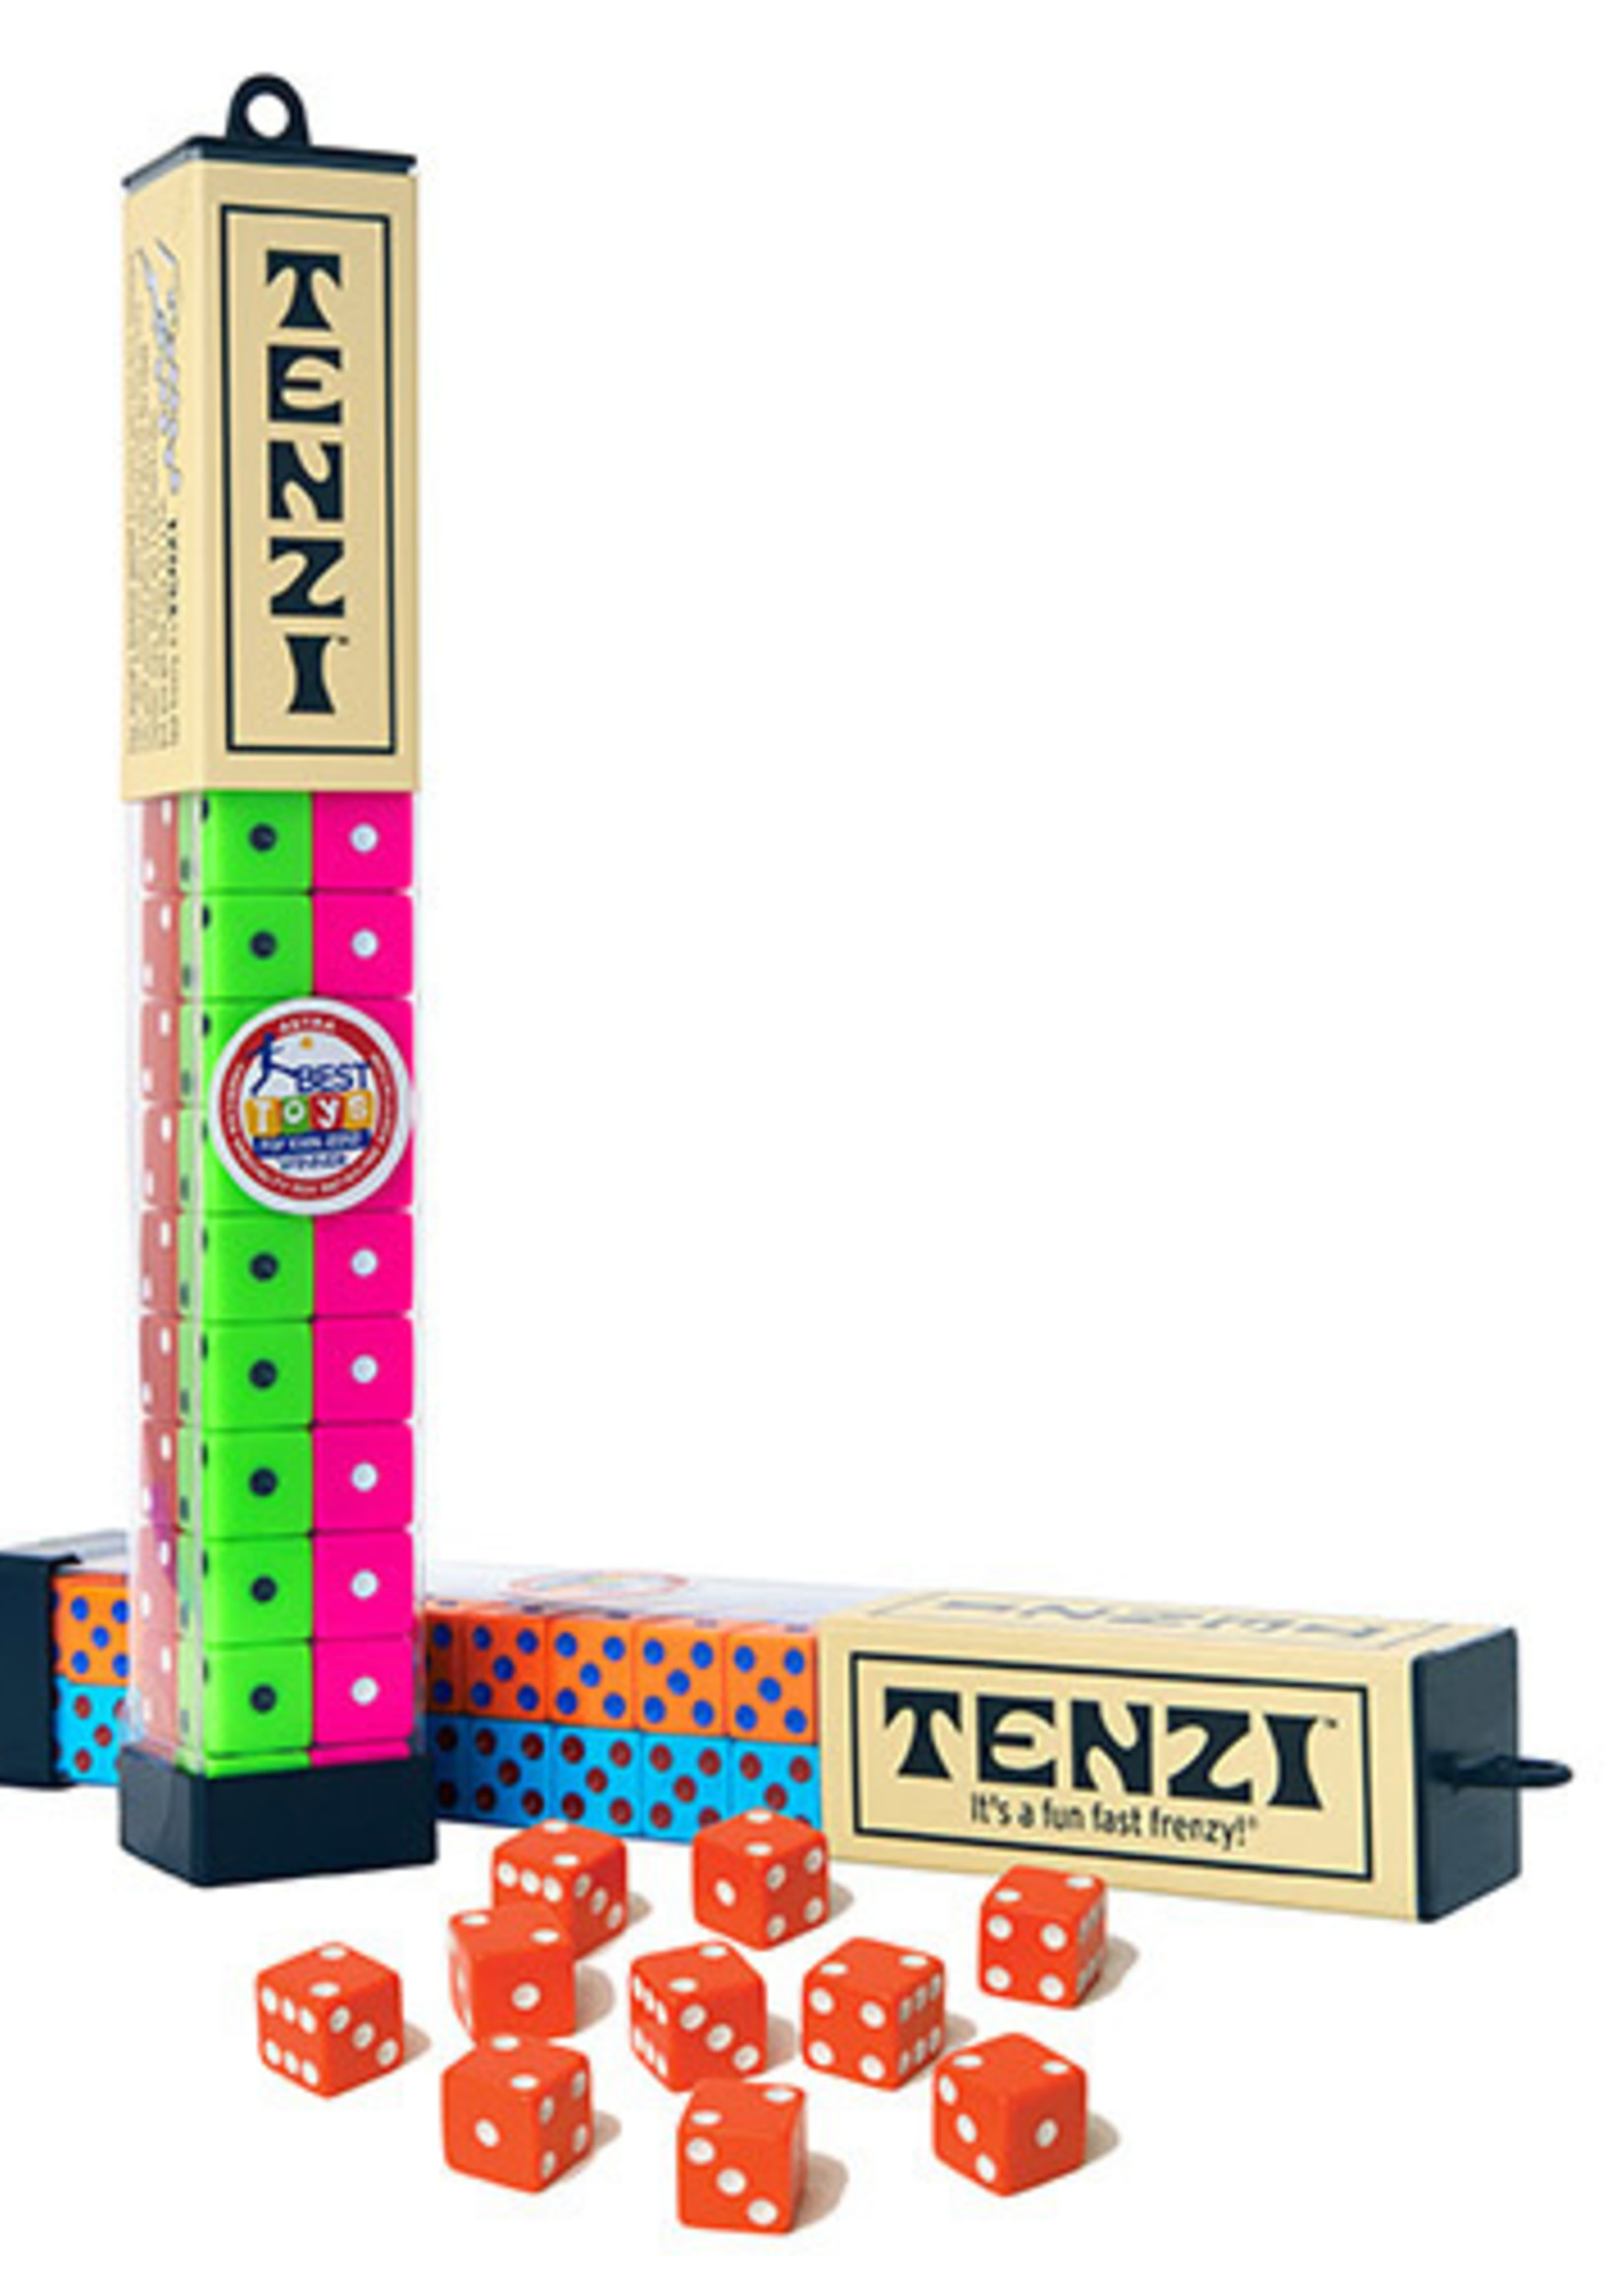 Tenzi TENZI Dice game